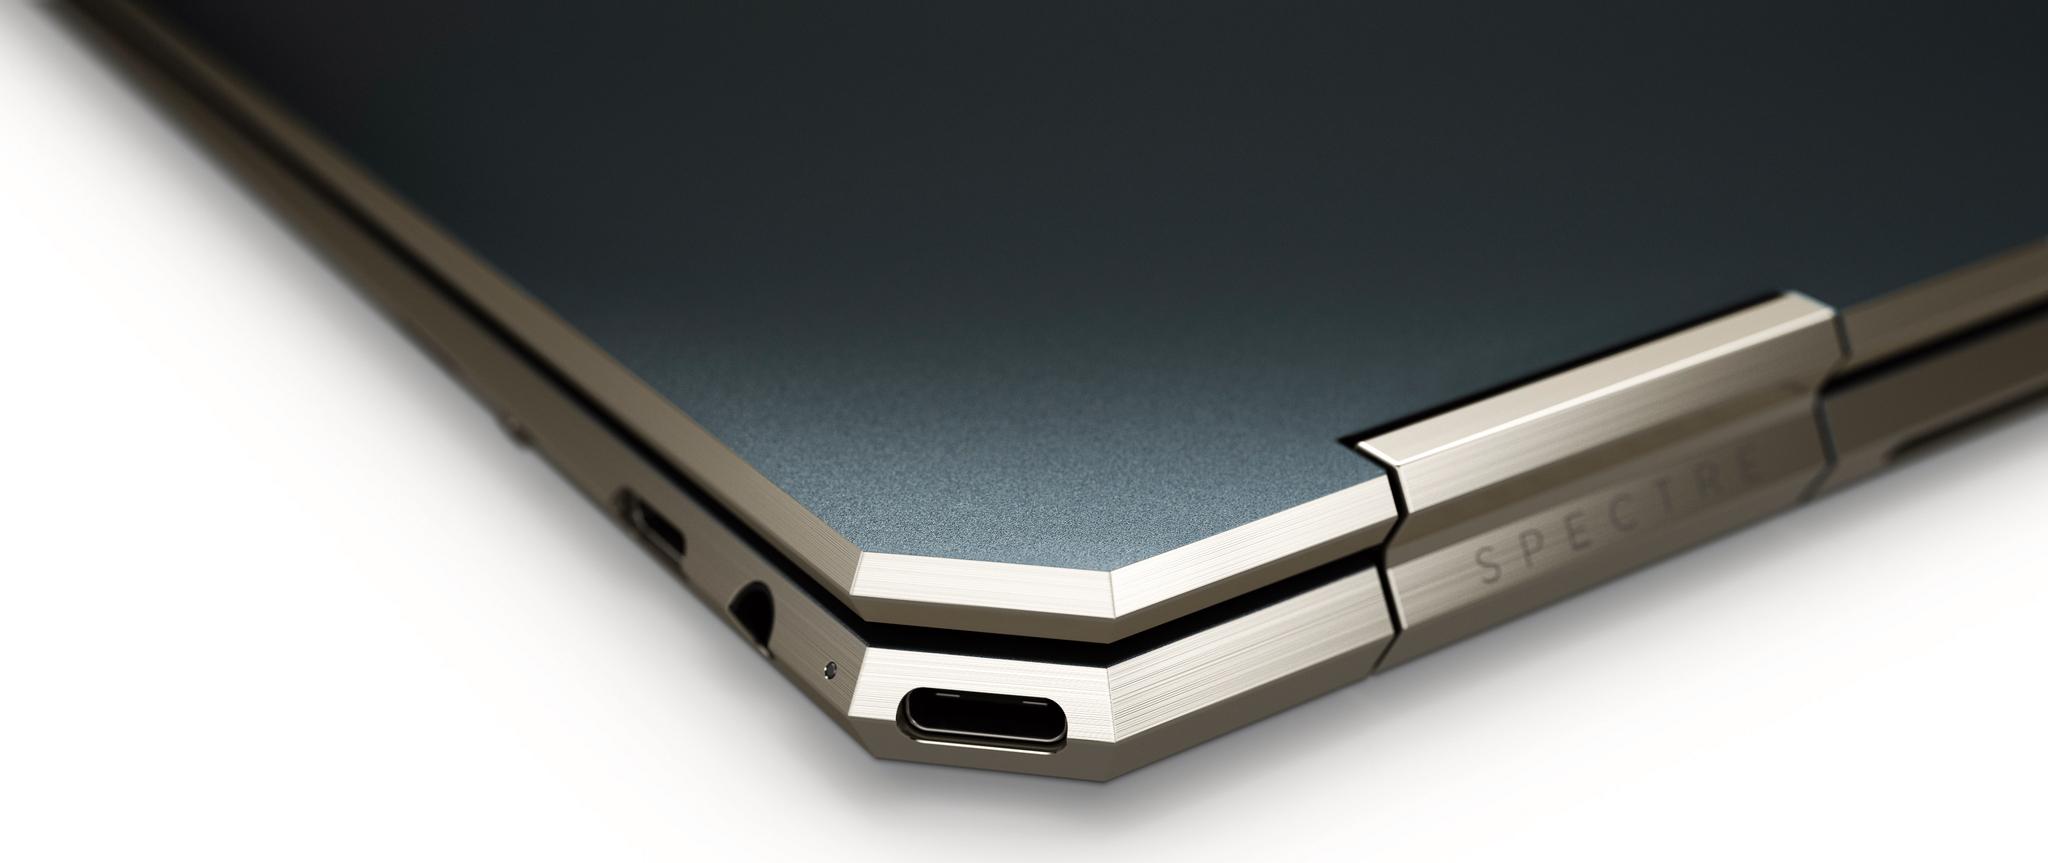 HP Launches Ultra-Thin HP Spectre 13 x360: Quad-Core i7